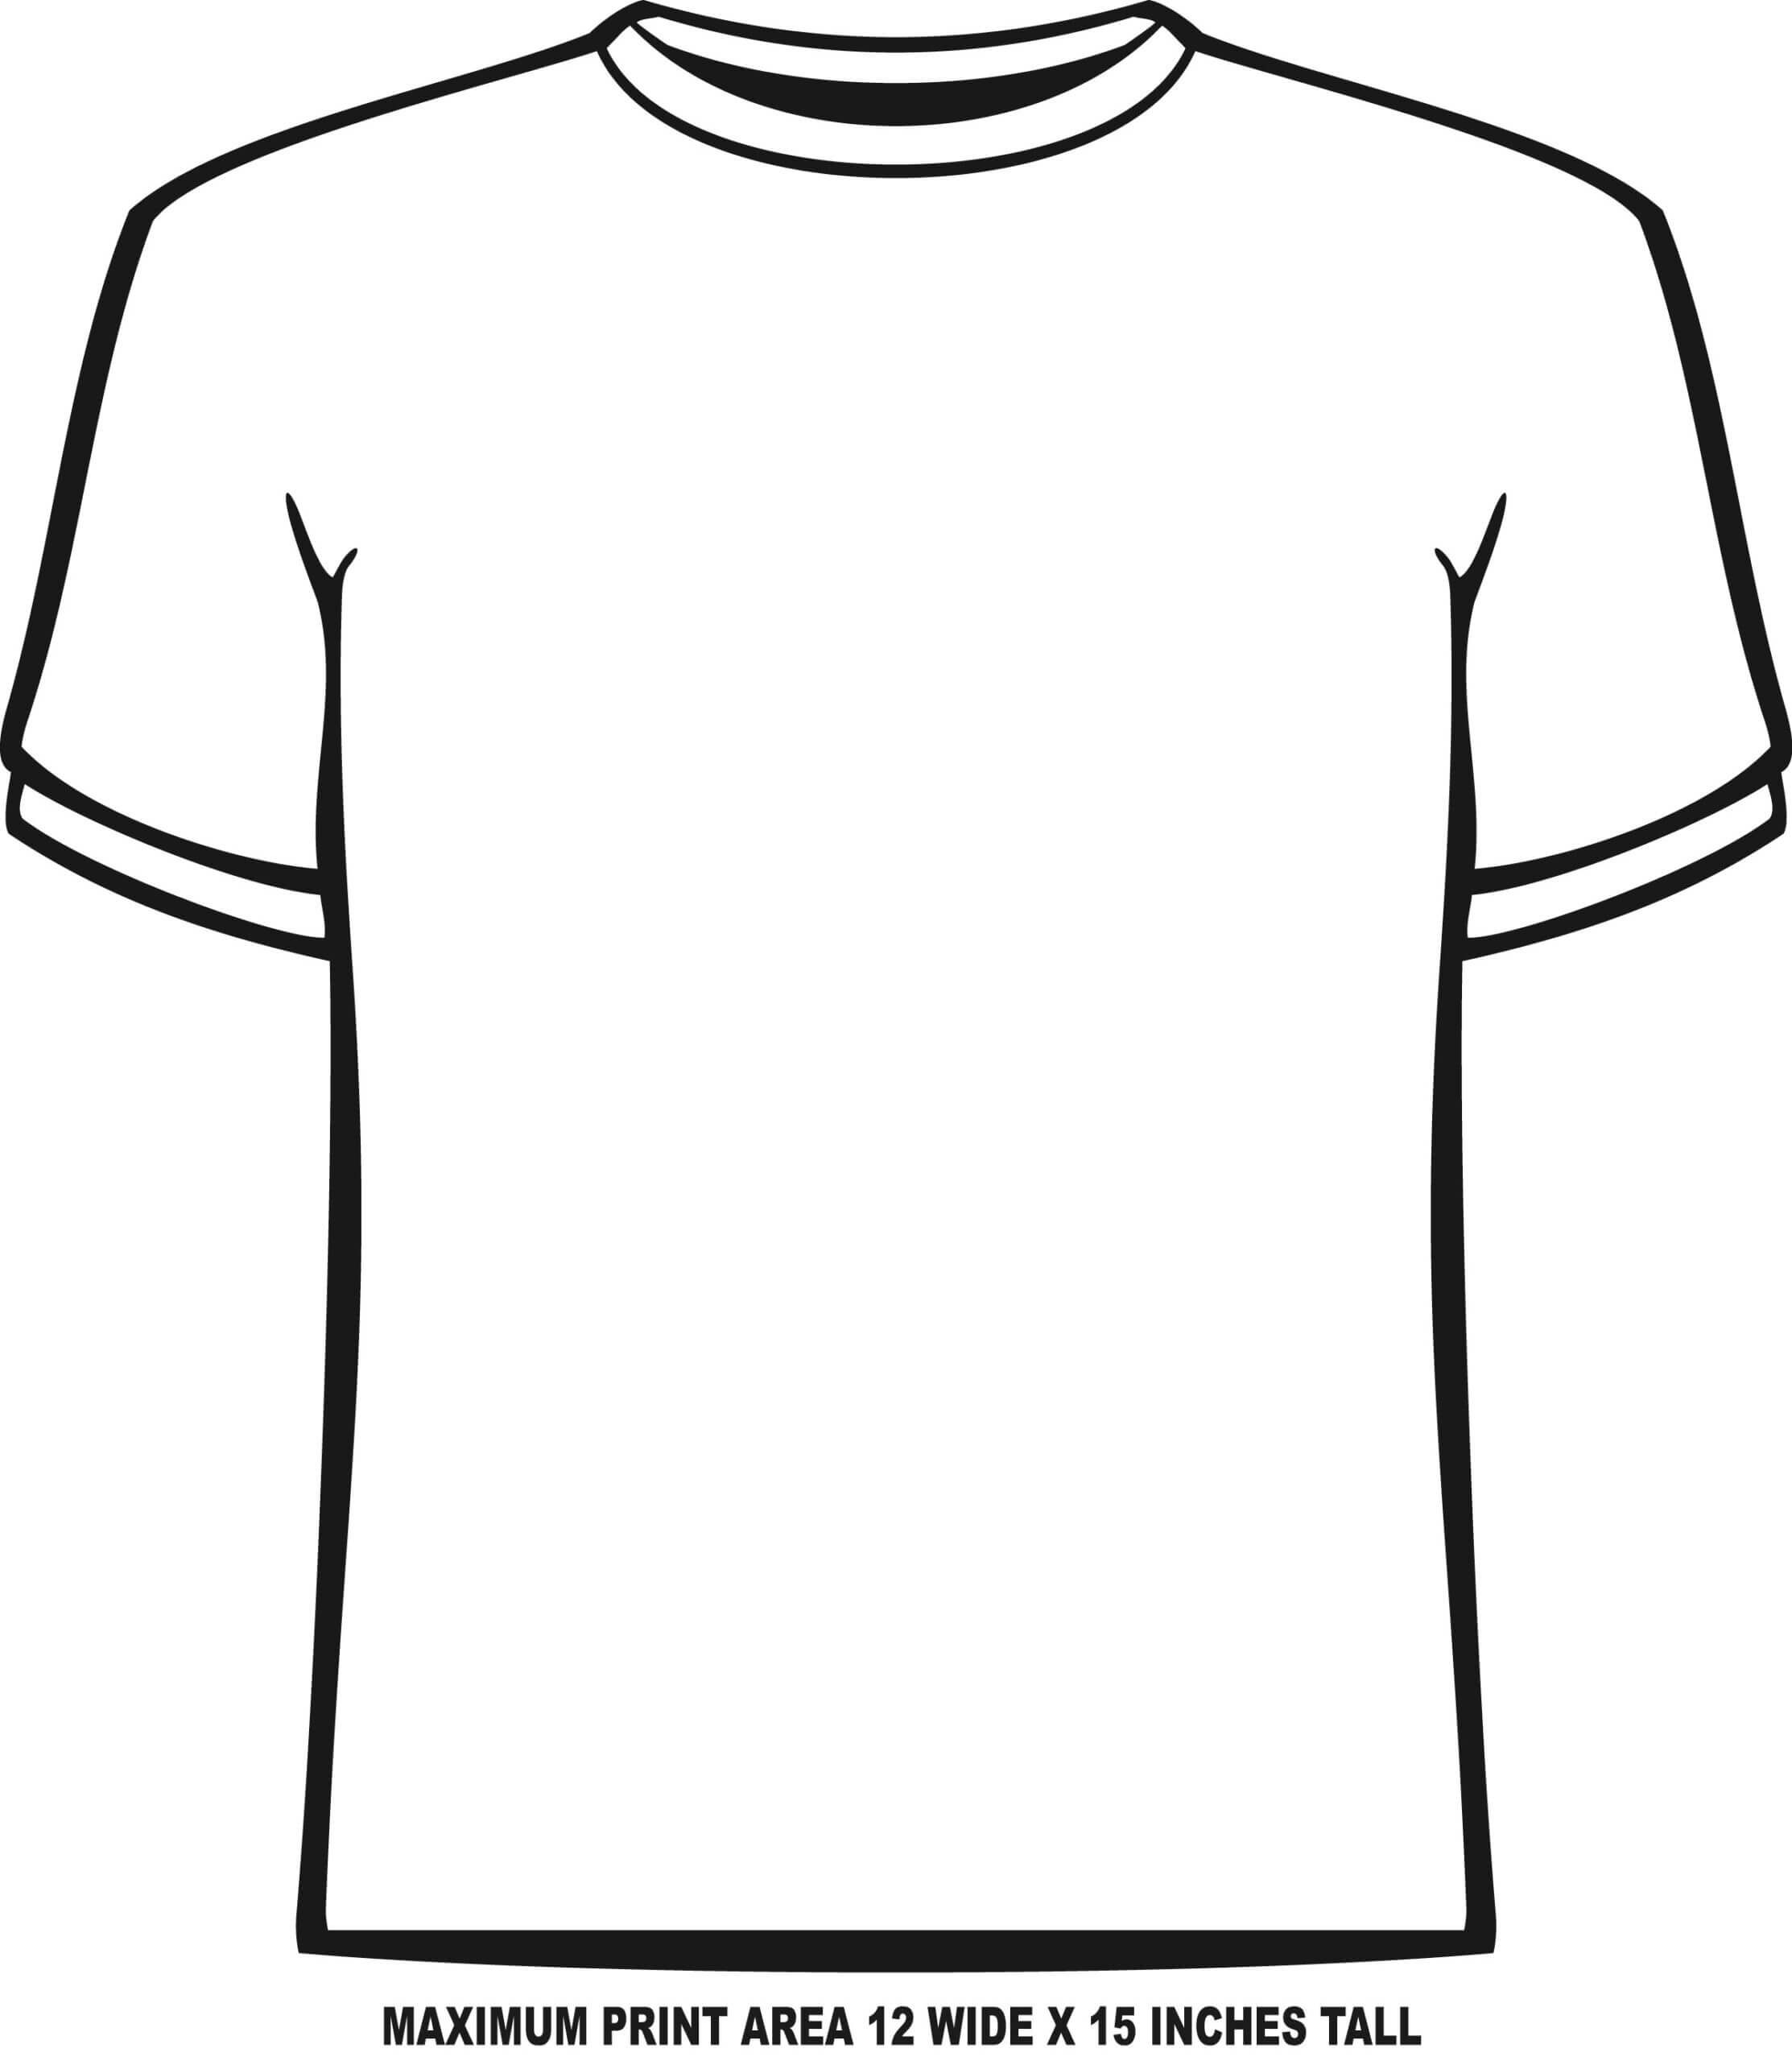 Blank Tshirt Template Pdf - Dreamworks With Blank Tshirt Template Pdf